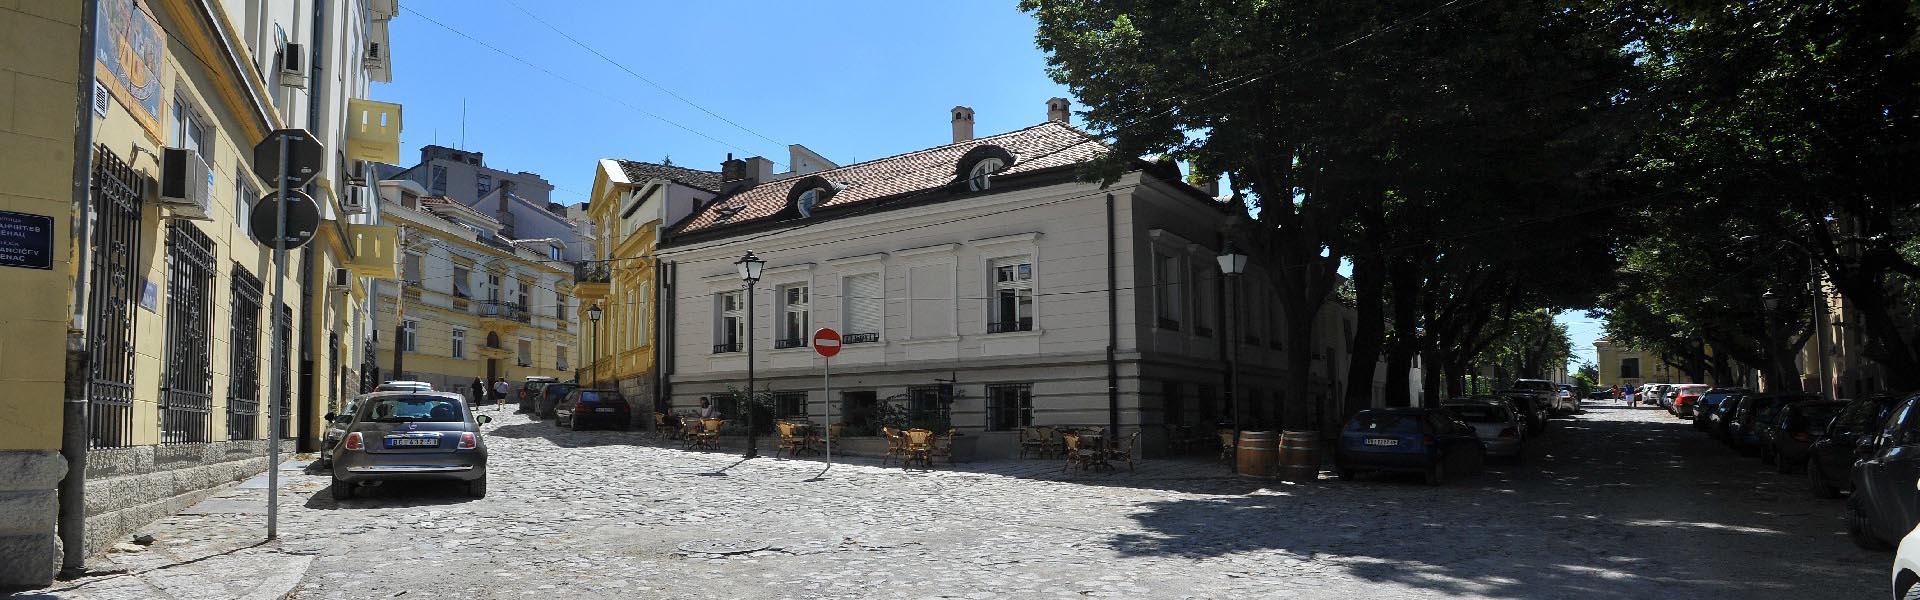 Dostava hrane Kosančićev venac | Beograd